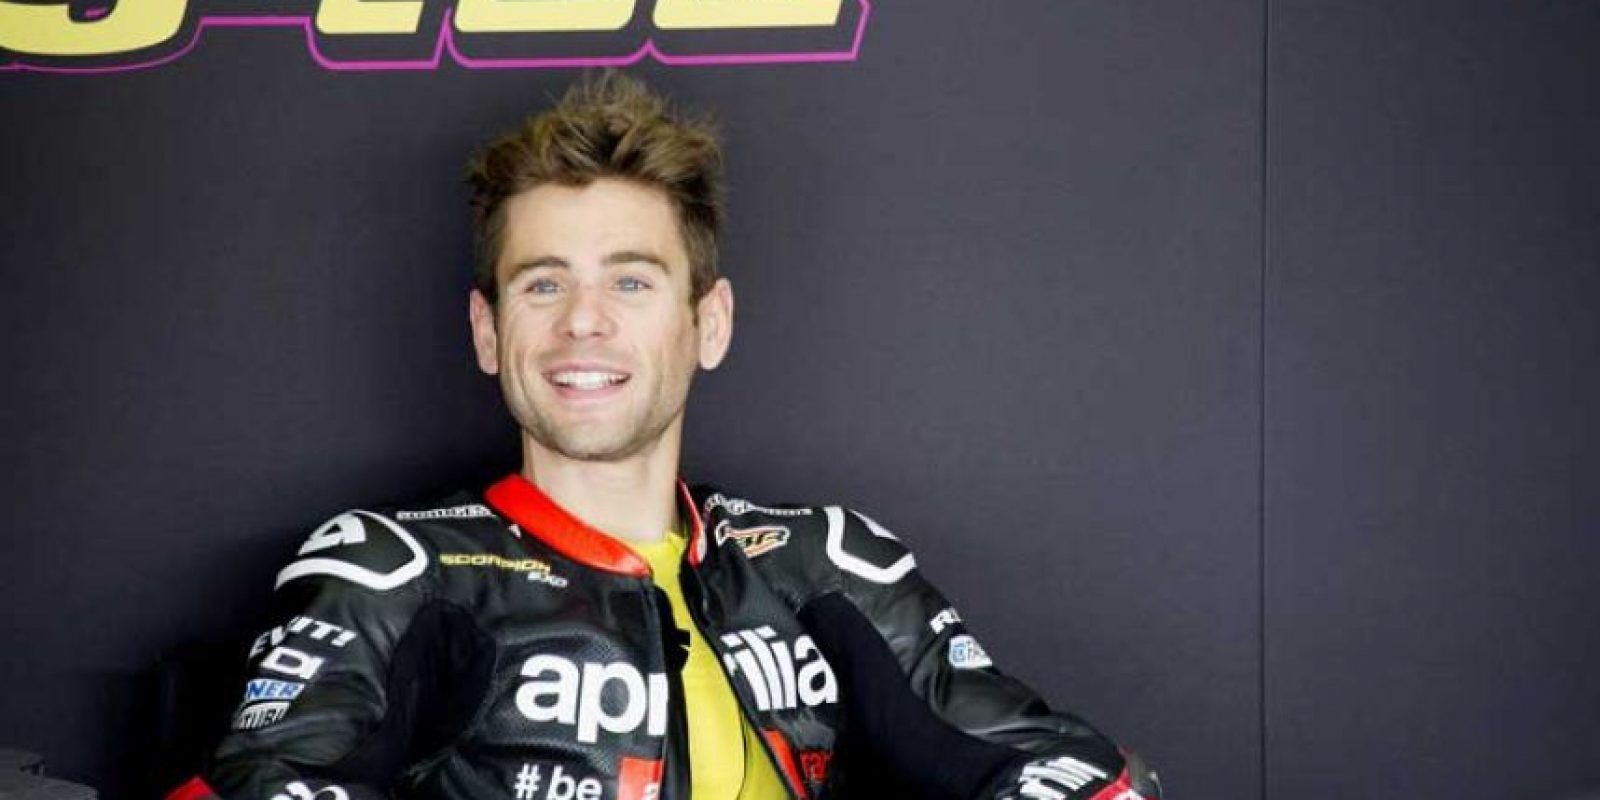 Álvaro Bautista (Piloto de Moto GP) Foto:Getty Images